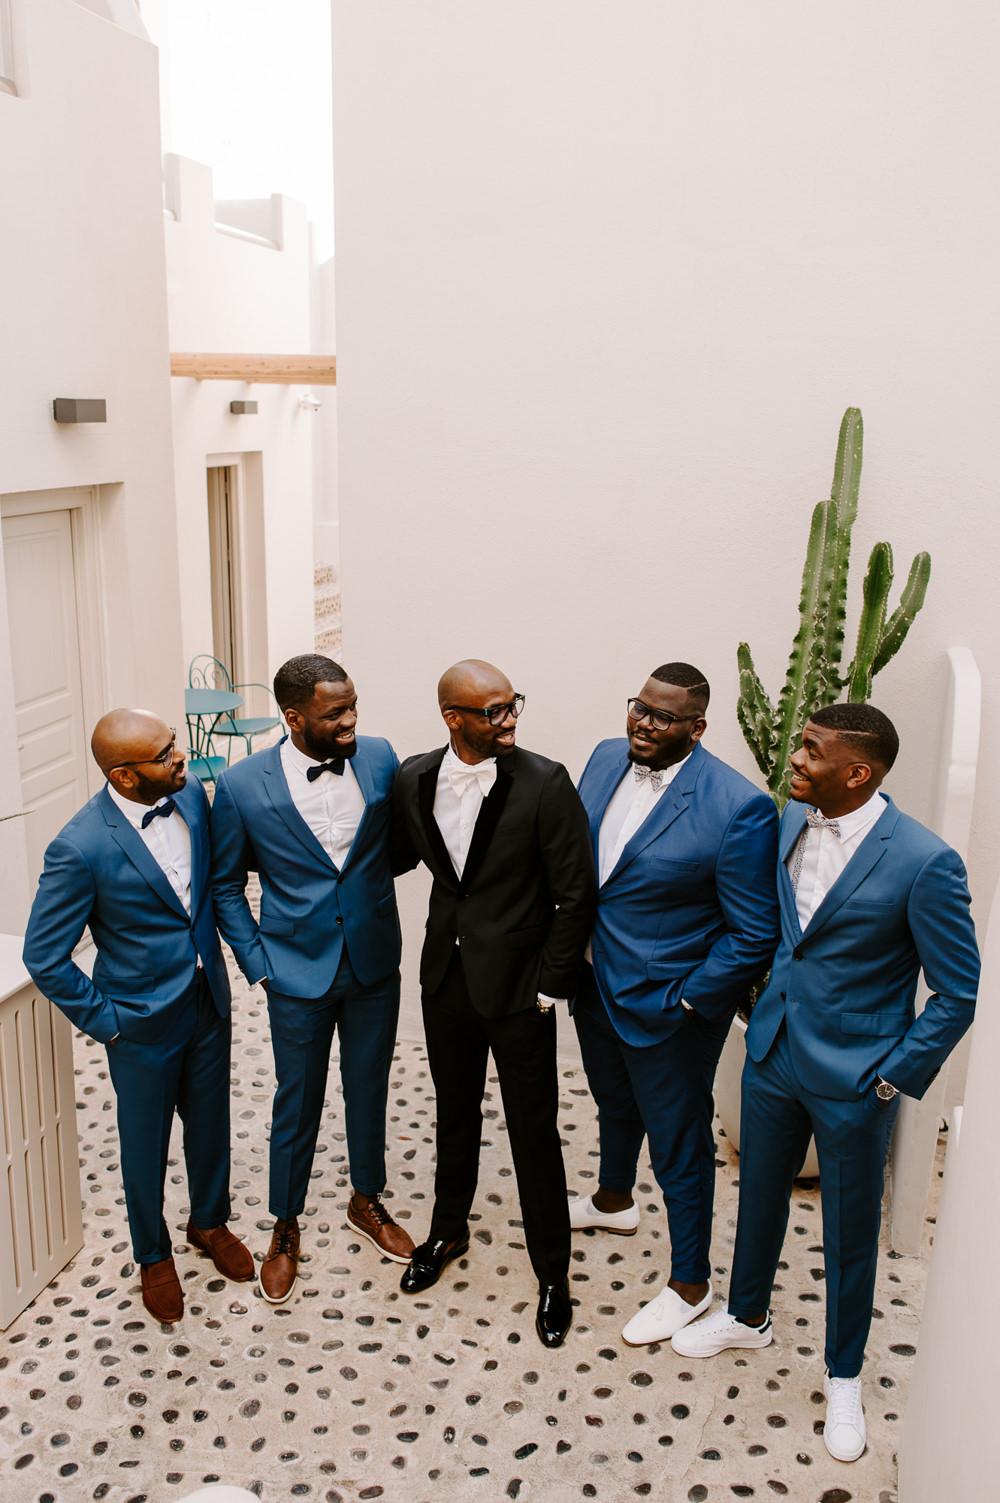 Groom Groomsmen Black Suit Tux Tuxedo Bow Tie Santorini Wedding Phosart Photography